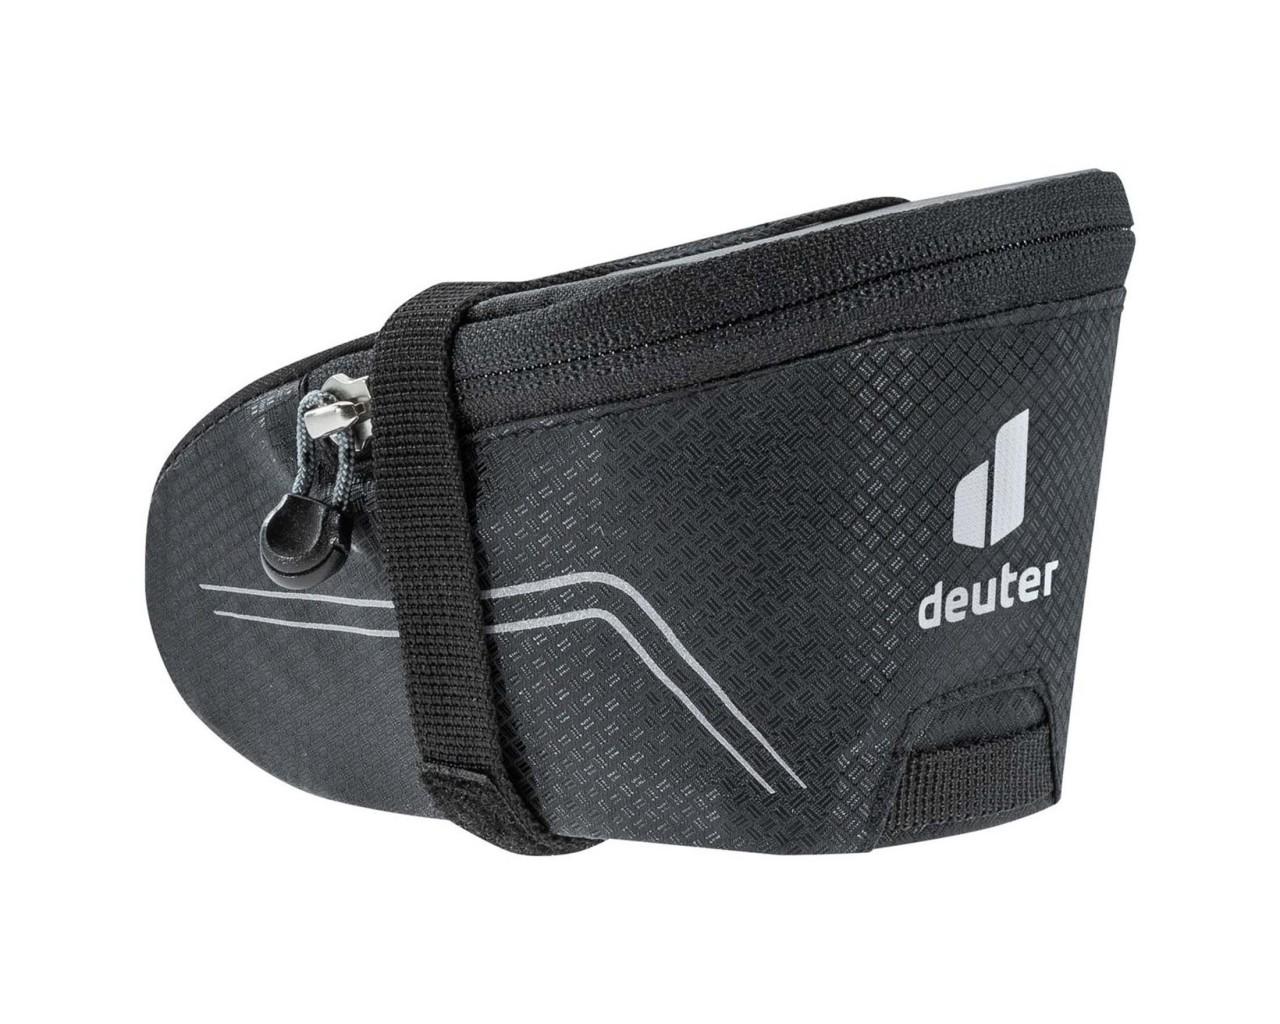 Deuter Bike Bag II - Saddle Bag PFC-free | black